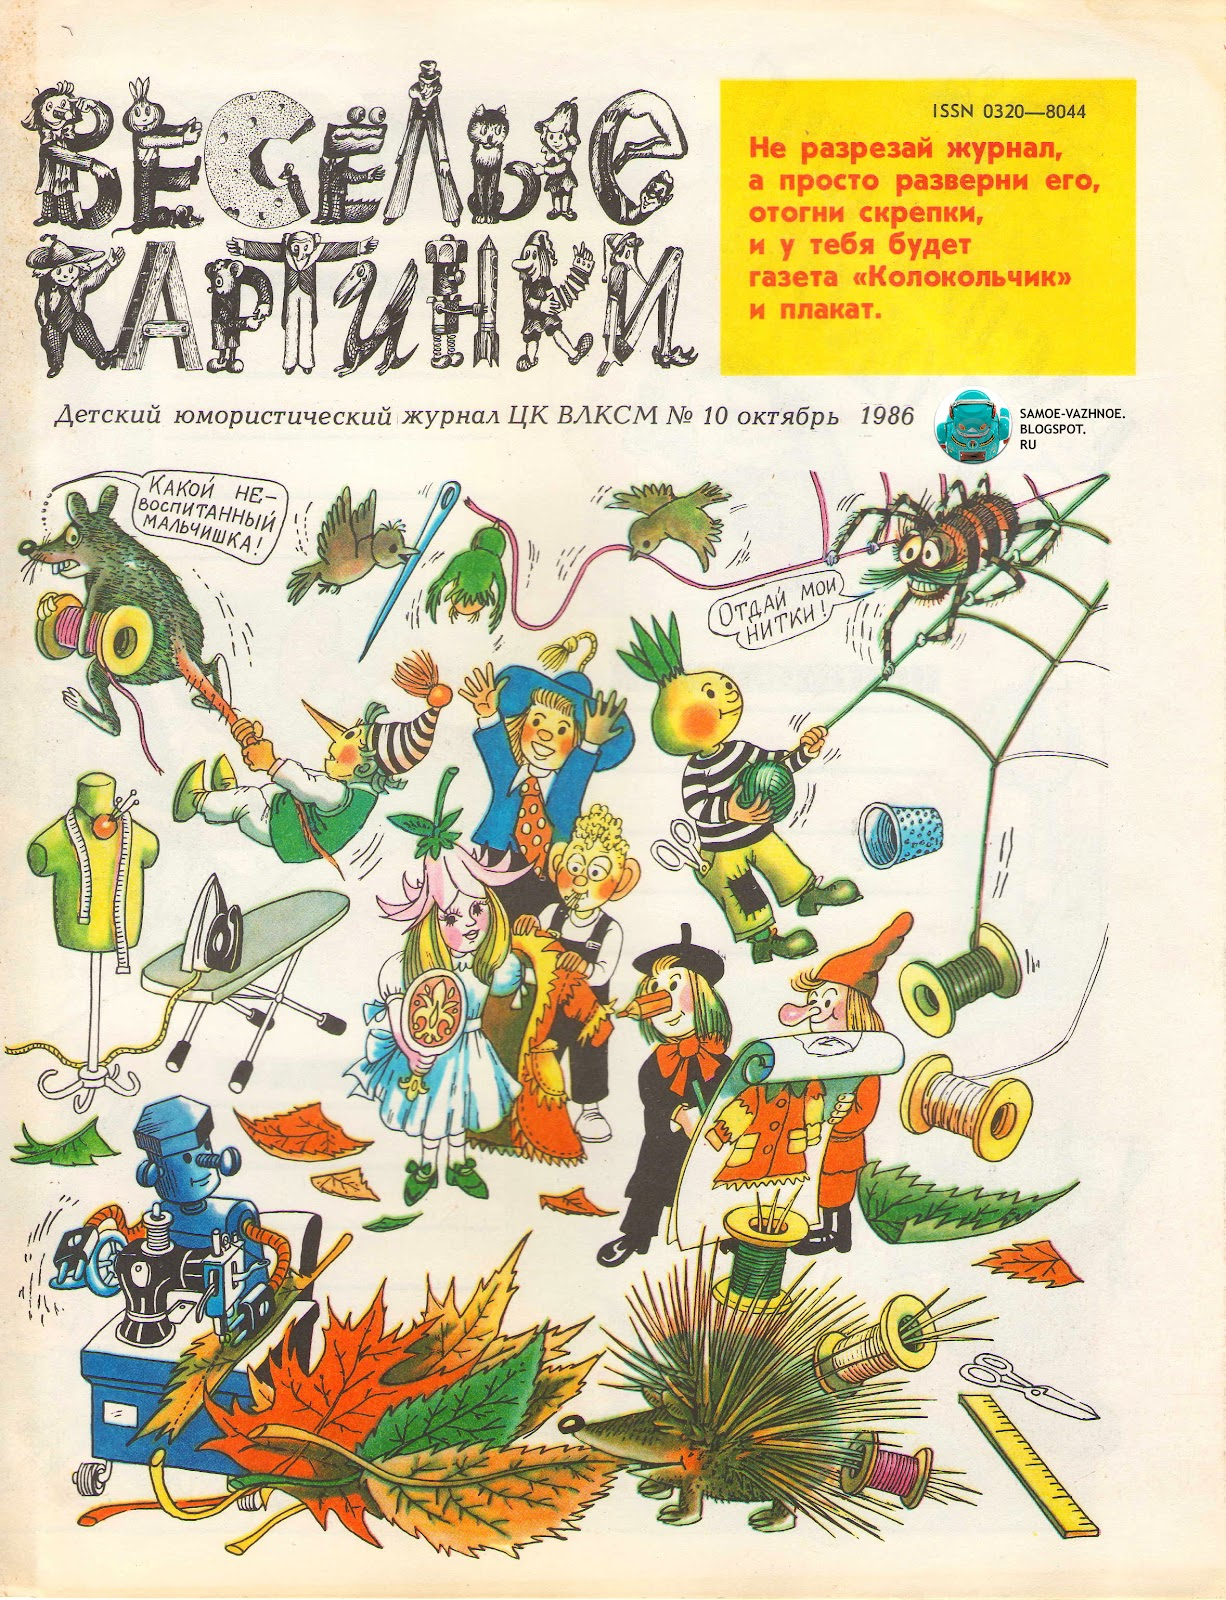 Архив журнала веселые картинки, бухгалтера